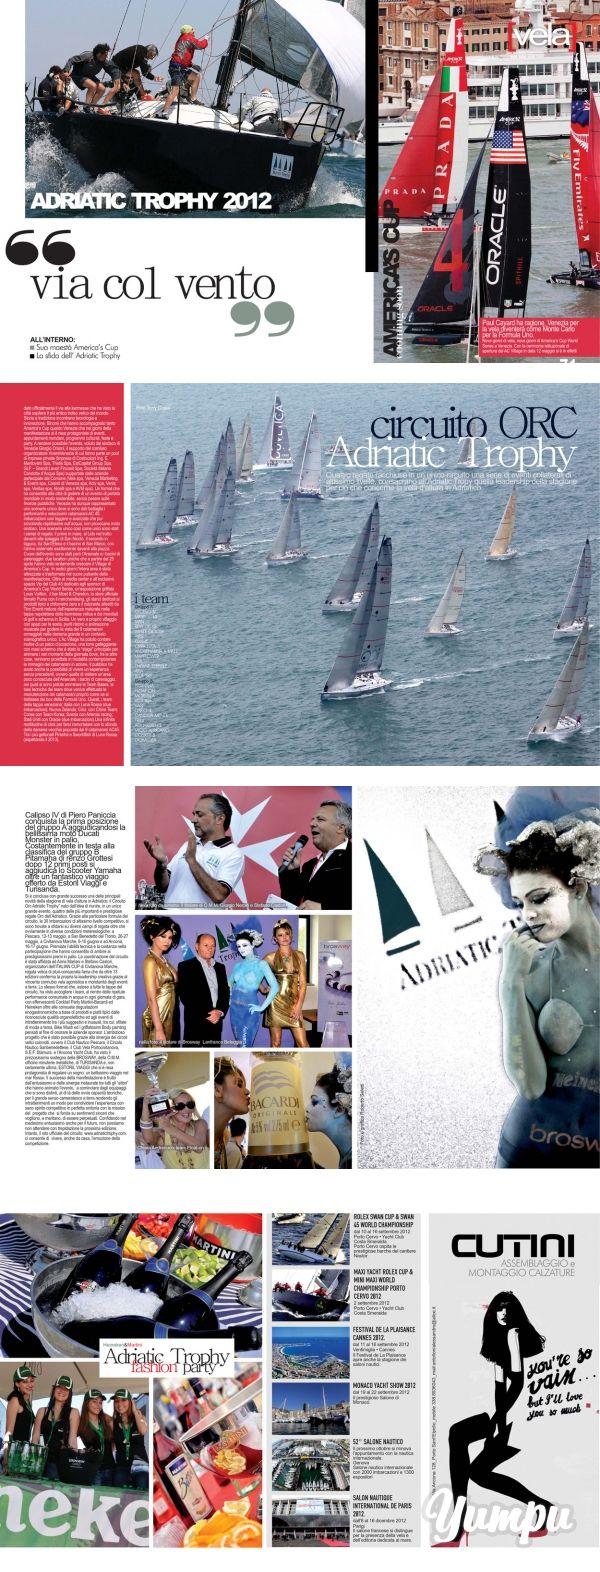 https://www.donnaimpresa.com vela.cdr - Donna Impresa Magazine - Magazine with 4 pages: 07 X vela.cdr - Donna Impresa Magazine